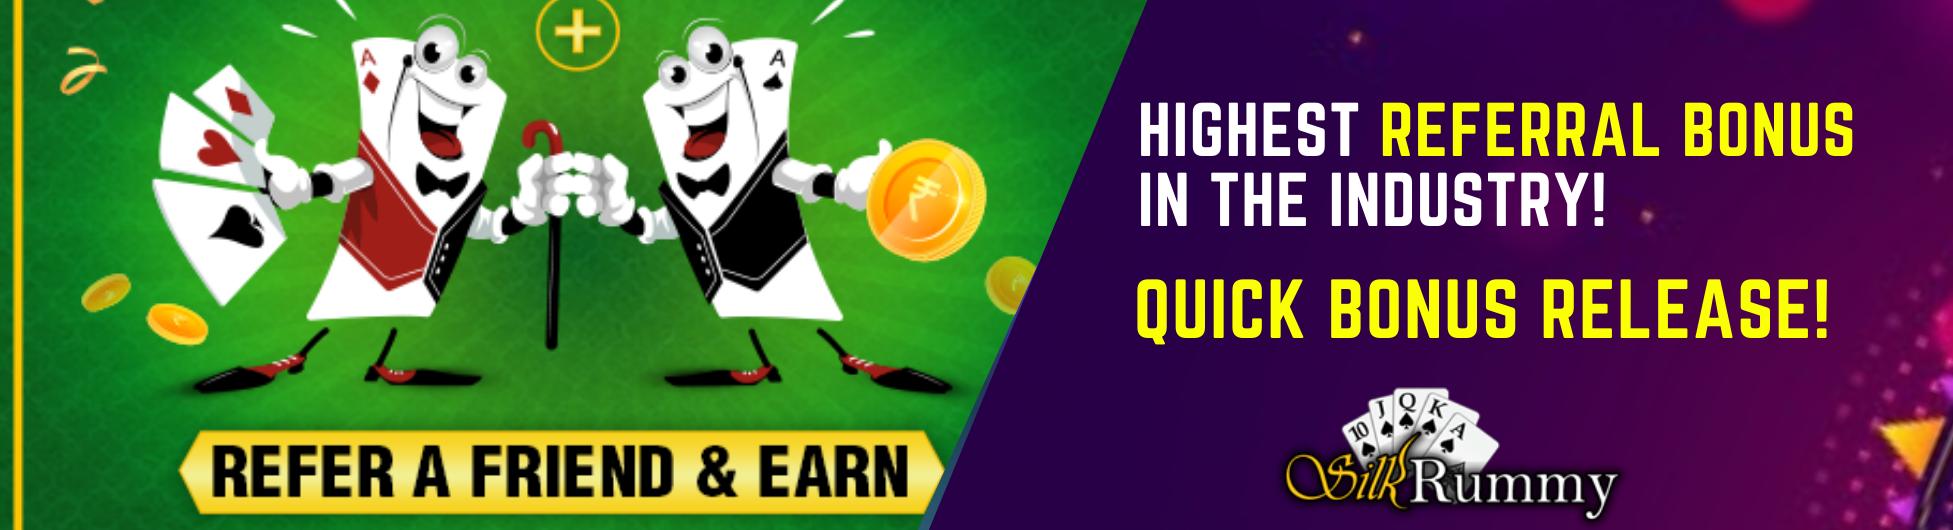 Rummy Highest referral bonus in the industry! Quick release! Silkrummy